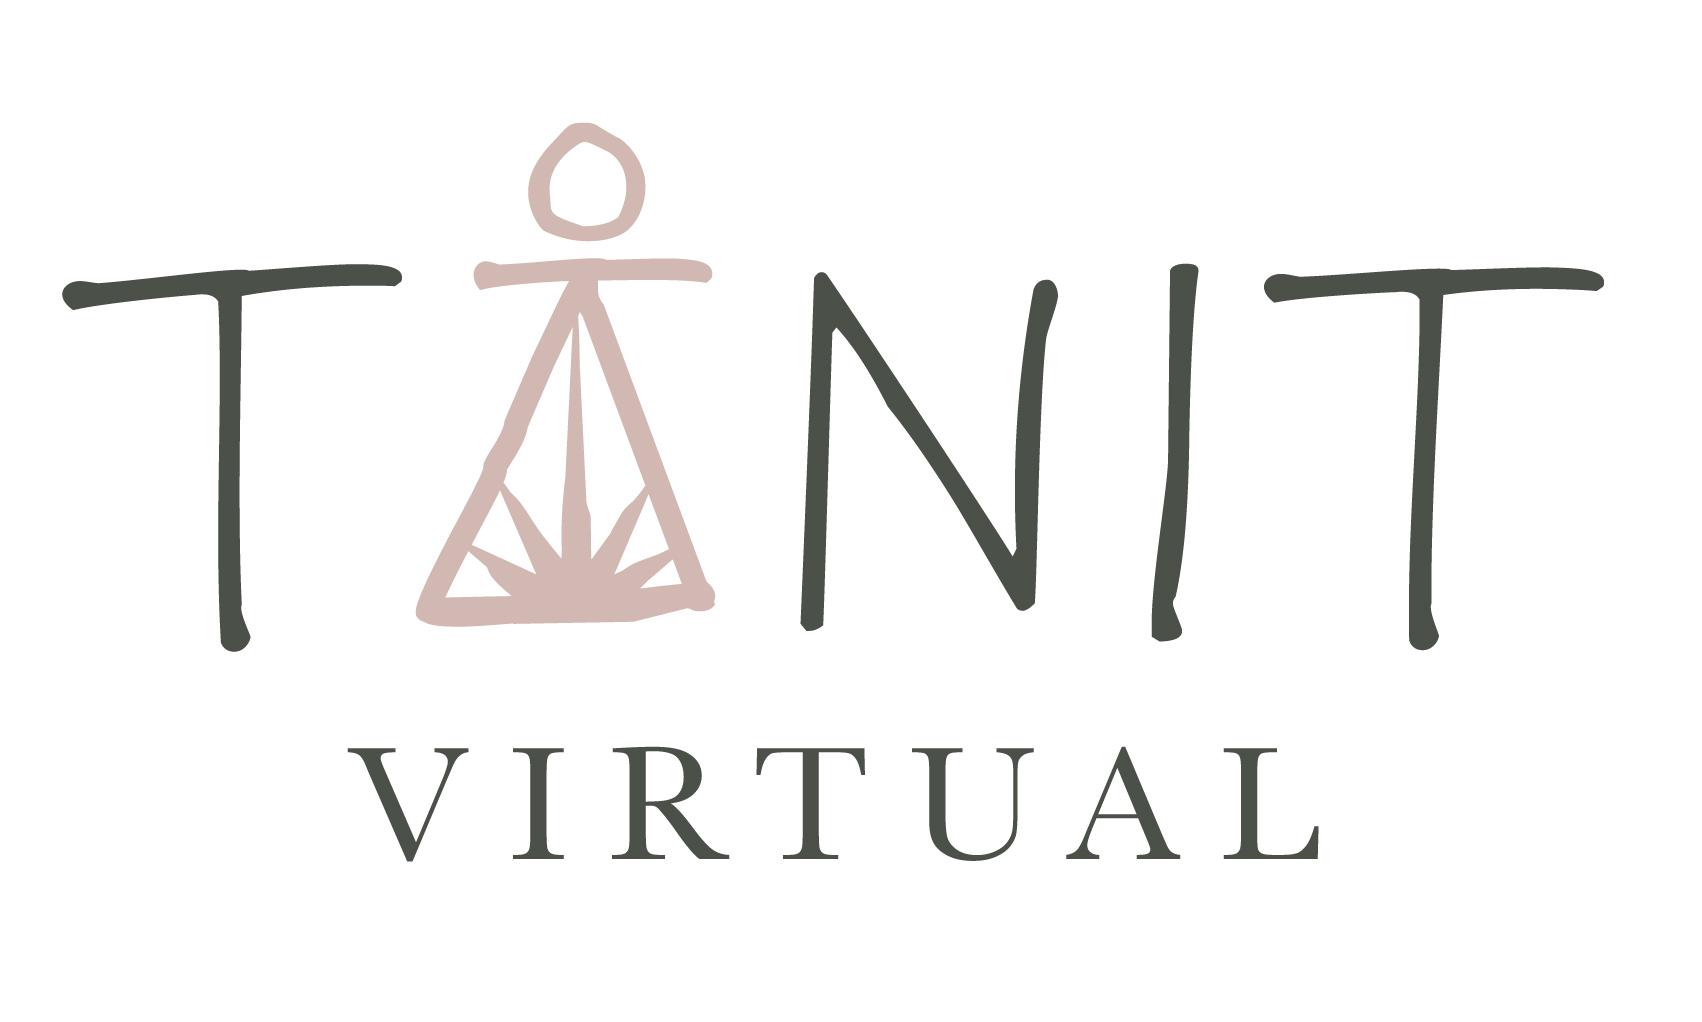 Tanit Virtual